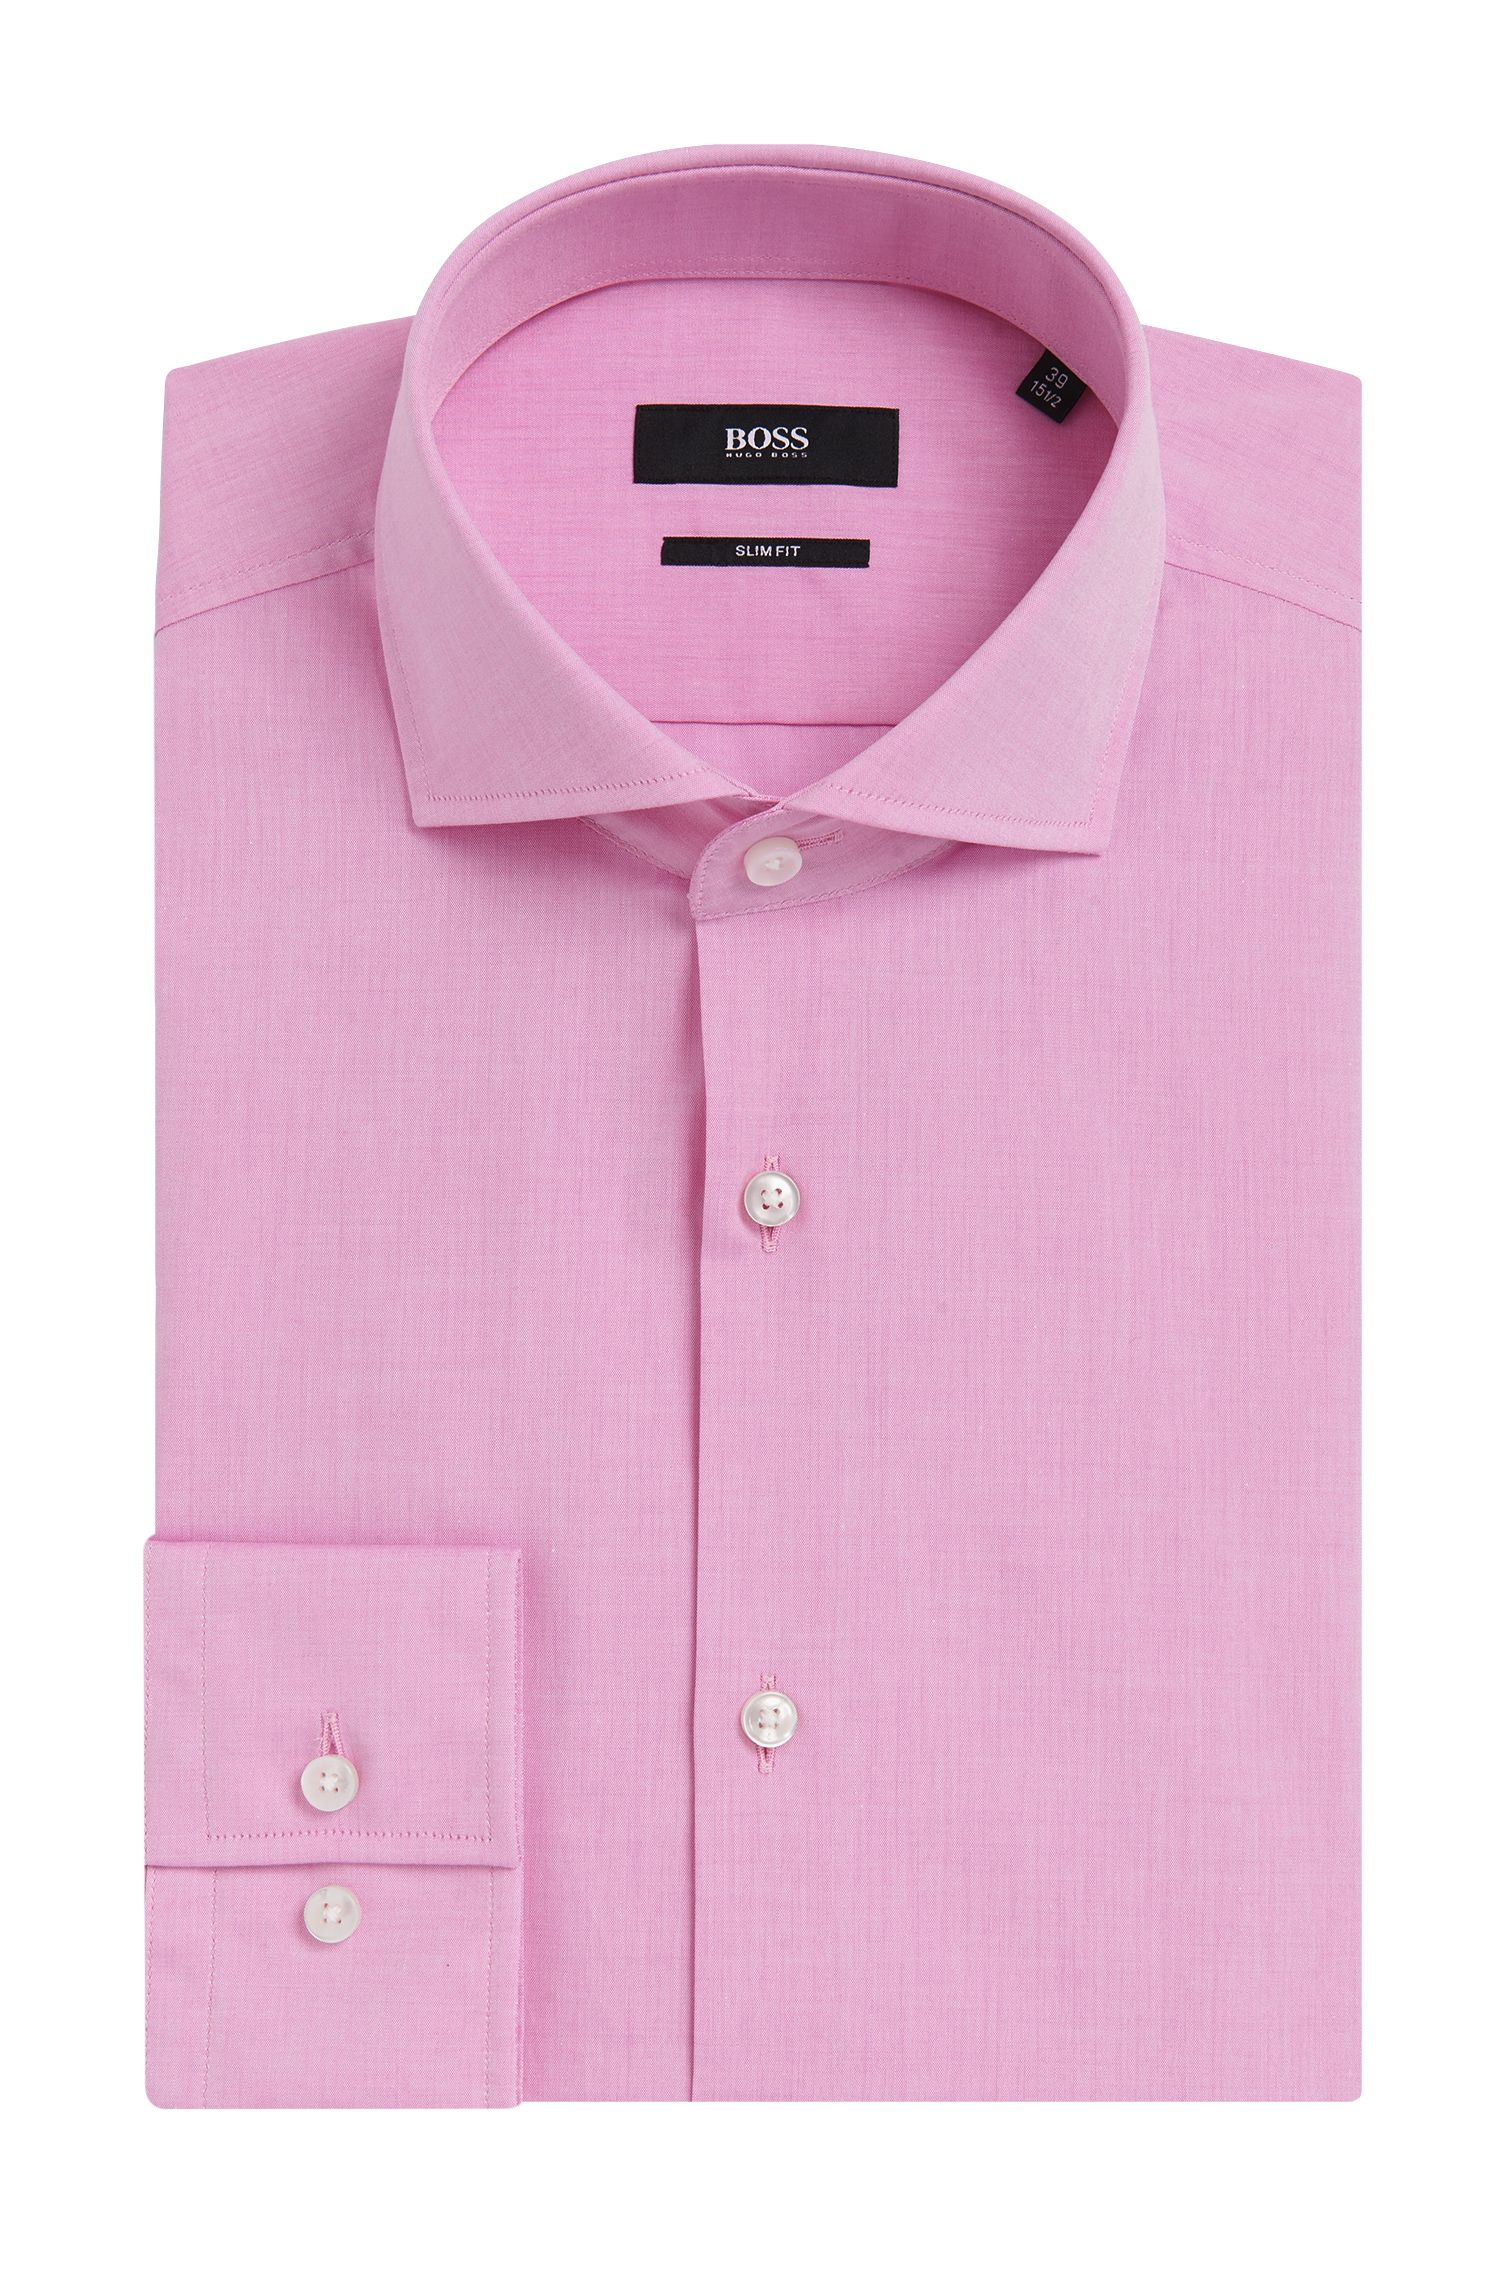 Yarn-Dyed Italian Cotton Dress Shirt, Slim Fit | Jason